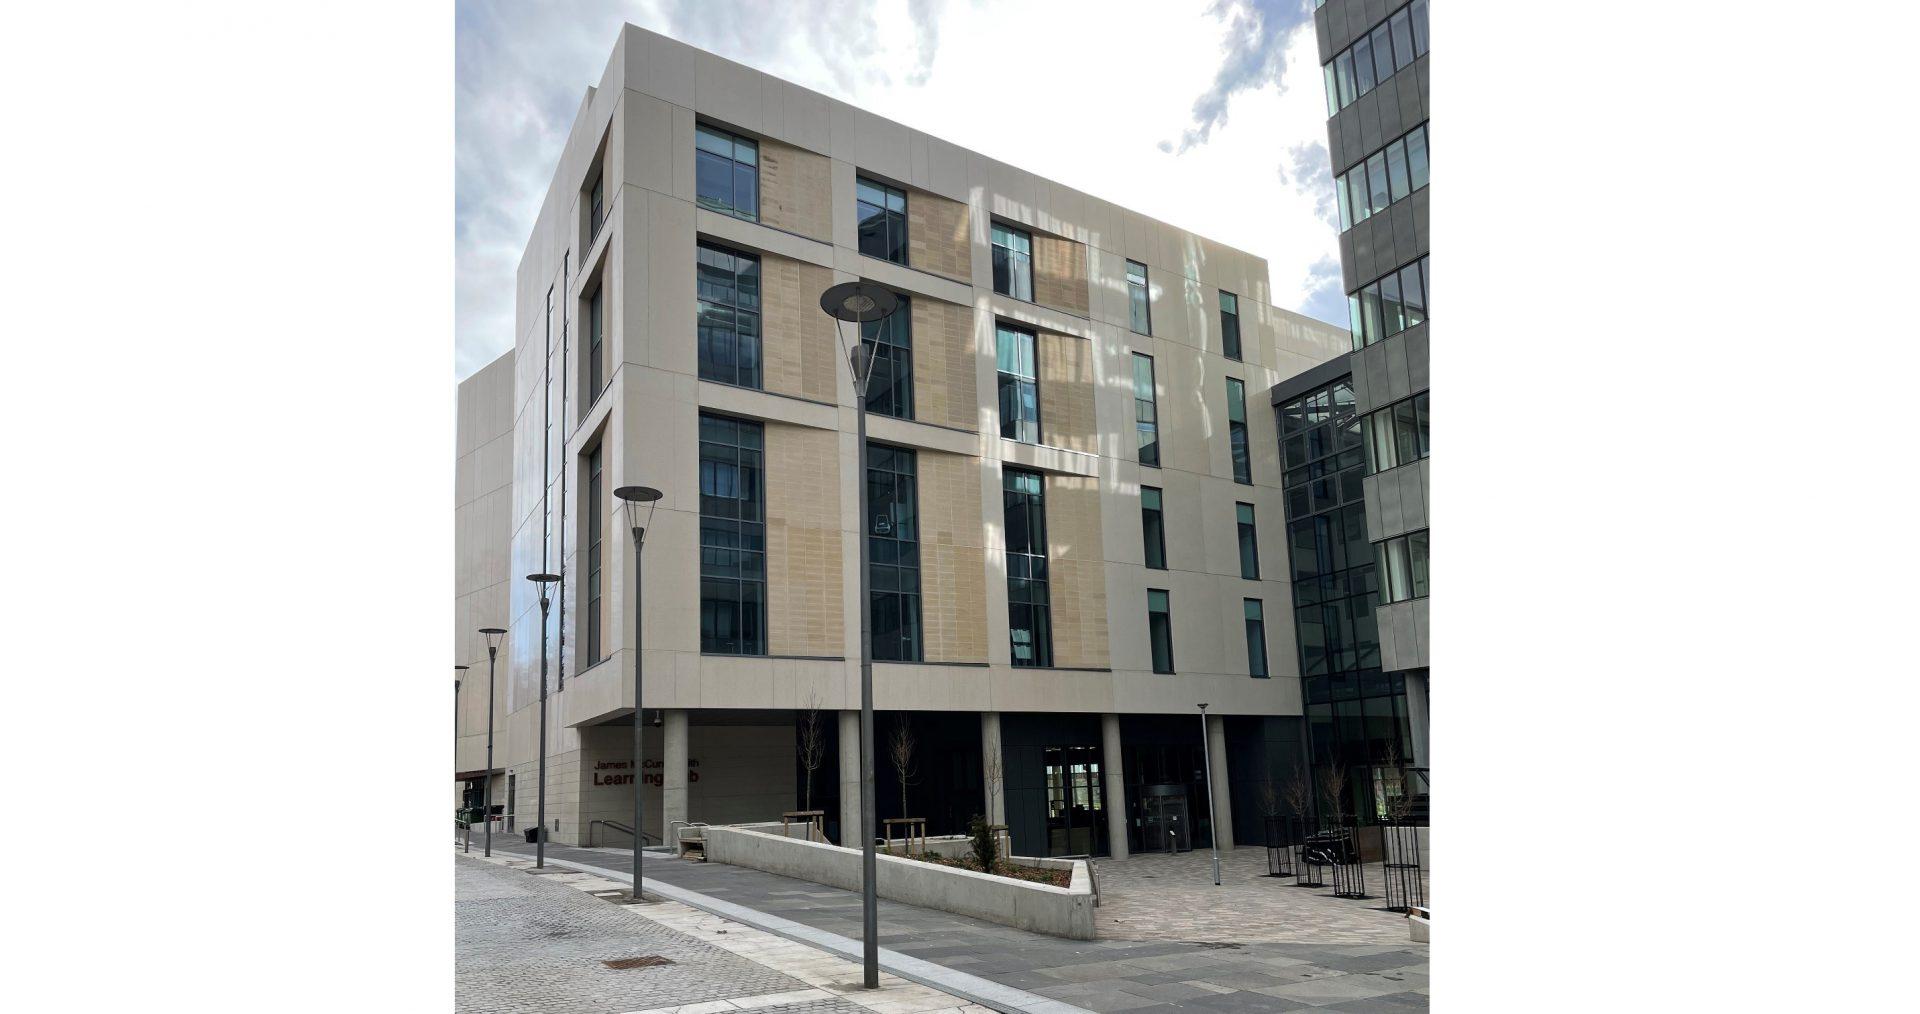 University of Glasgow - LTH